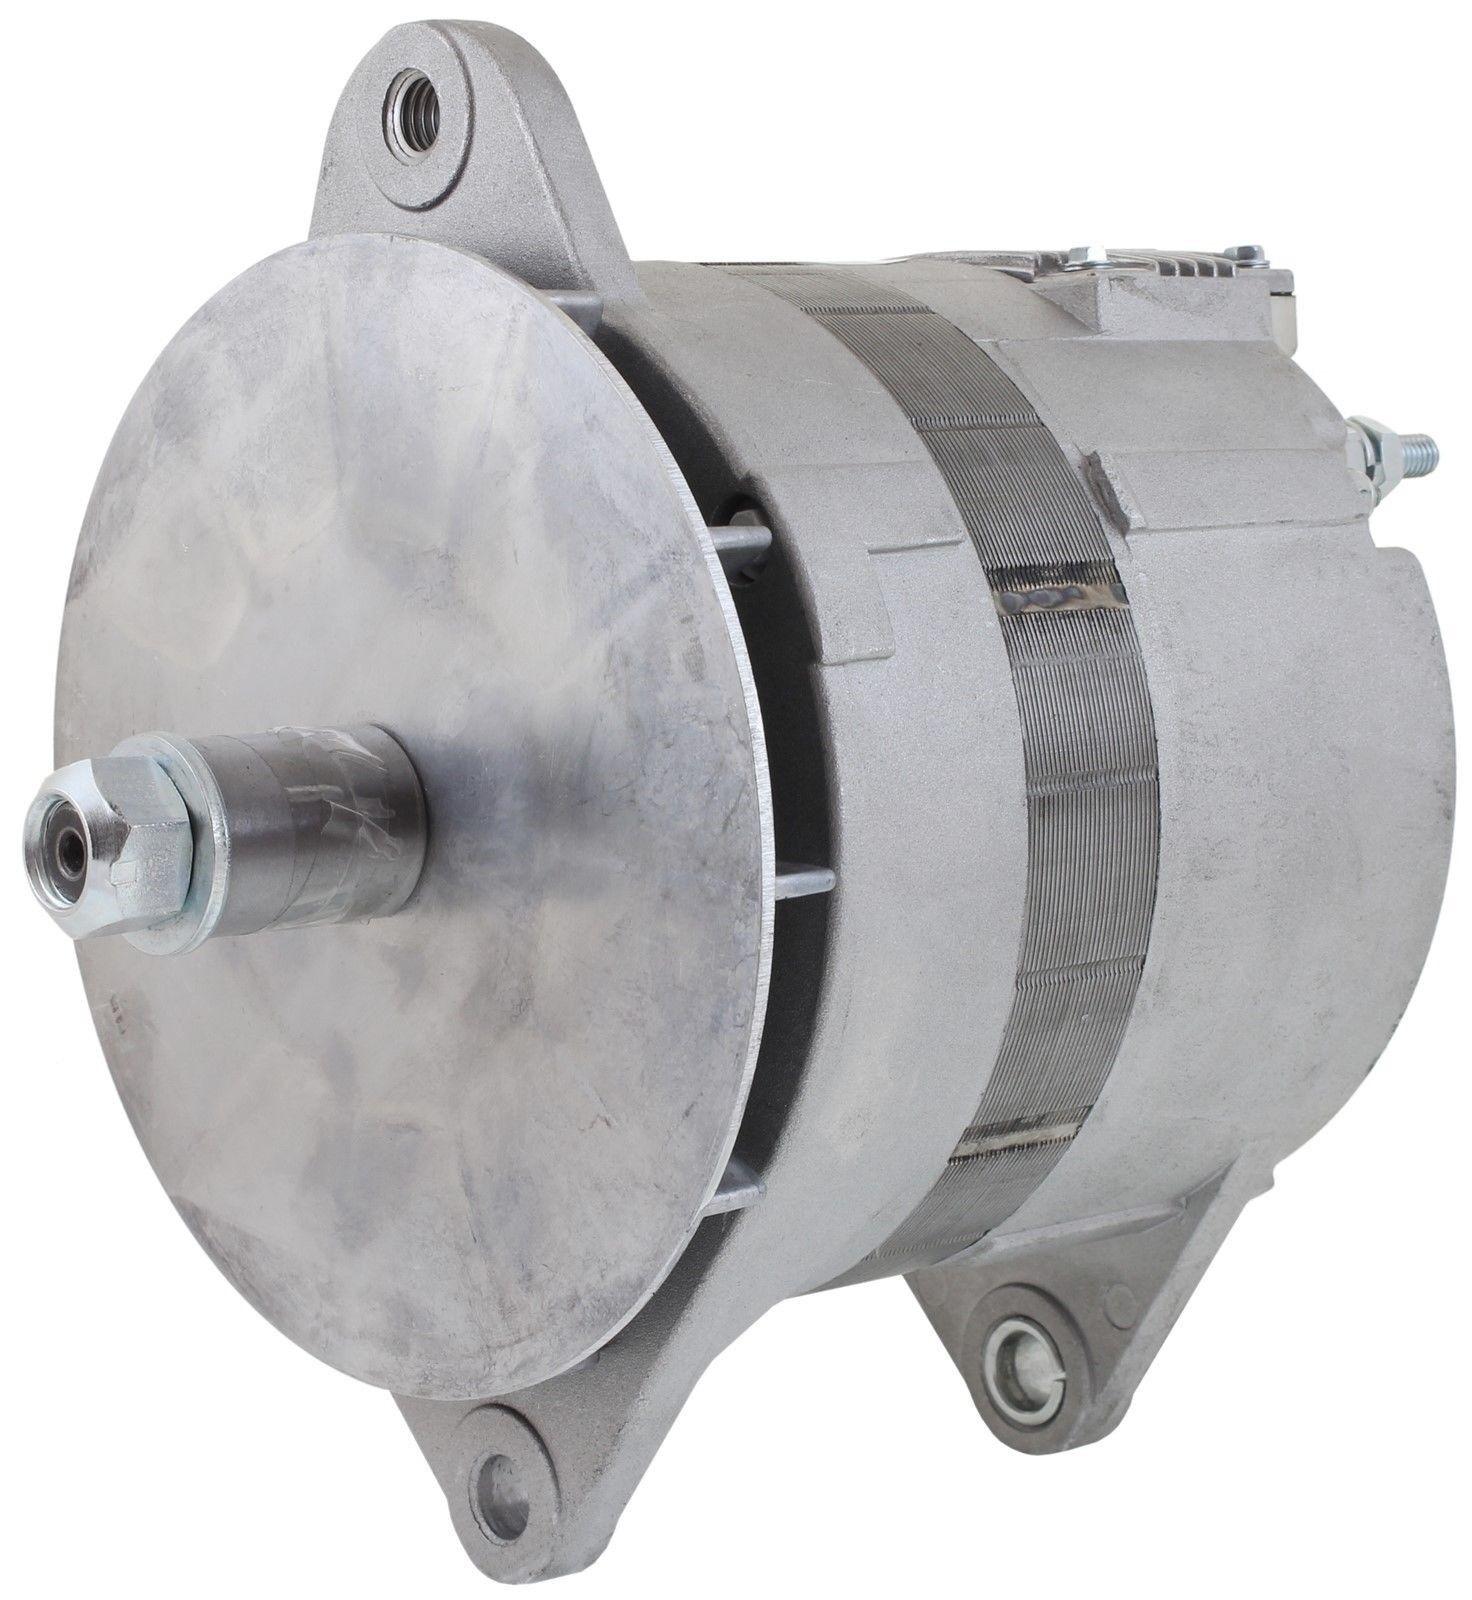 New Leece Neville Alternator 160 Amp Duvac Motorohomes Rv's 2824LC 2825LC El-039